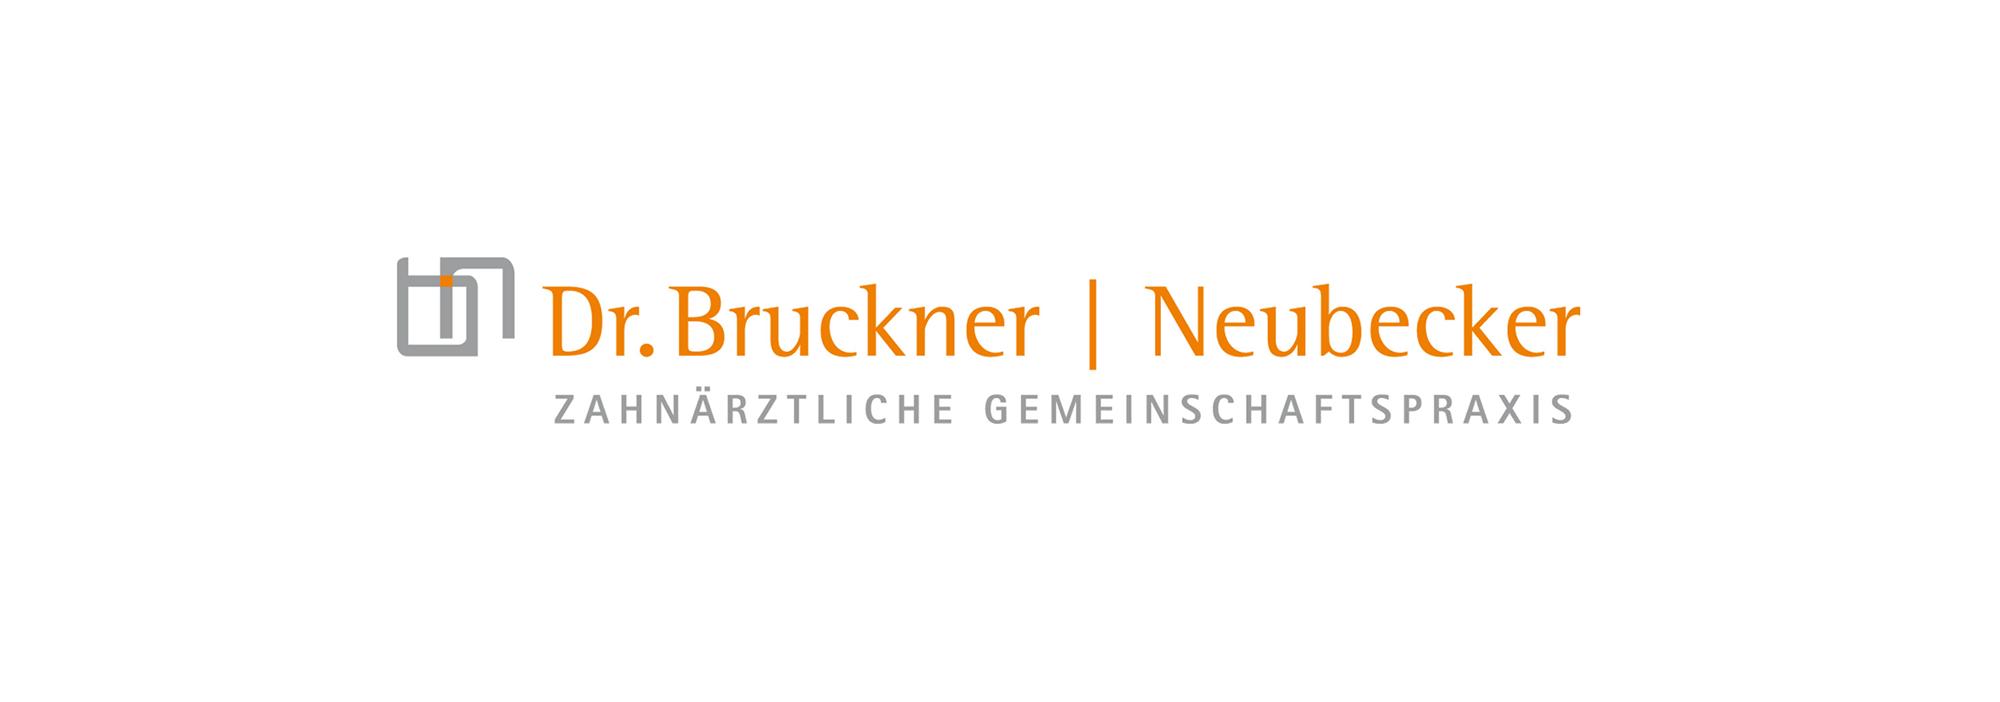 Ö-bergstromdesign.de-projekte-drbruckner-logo